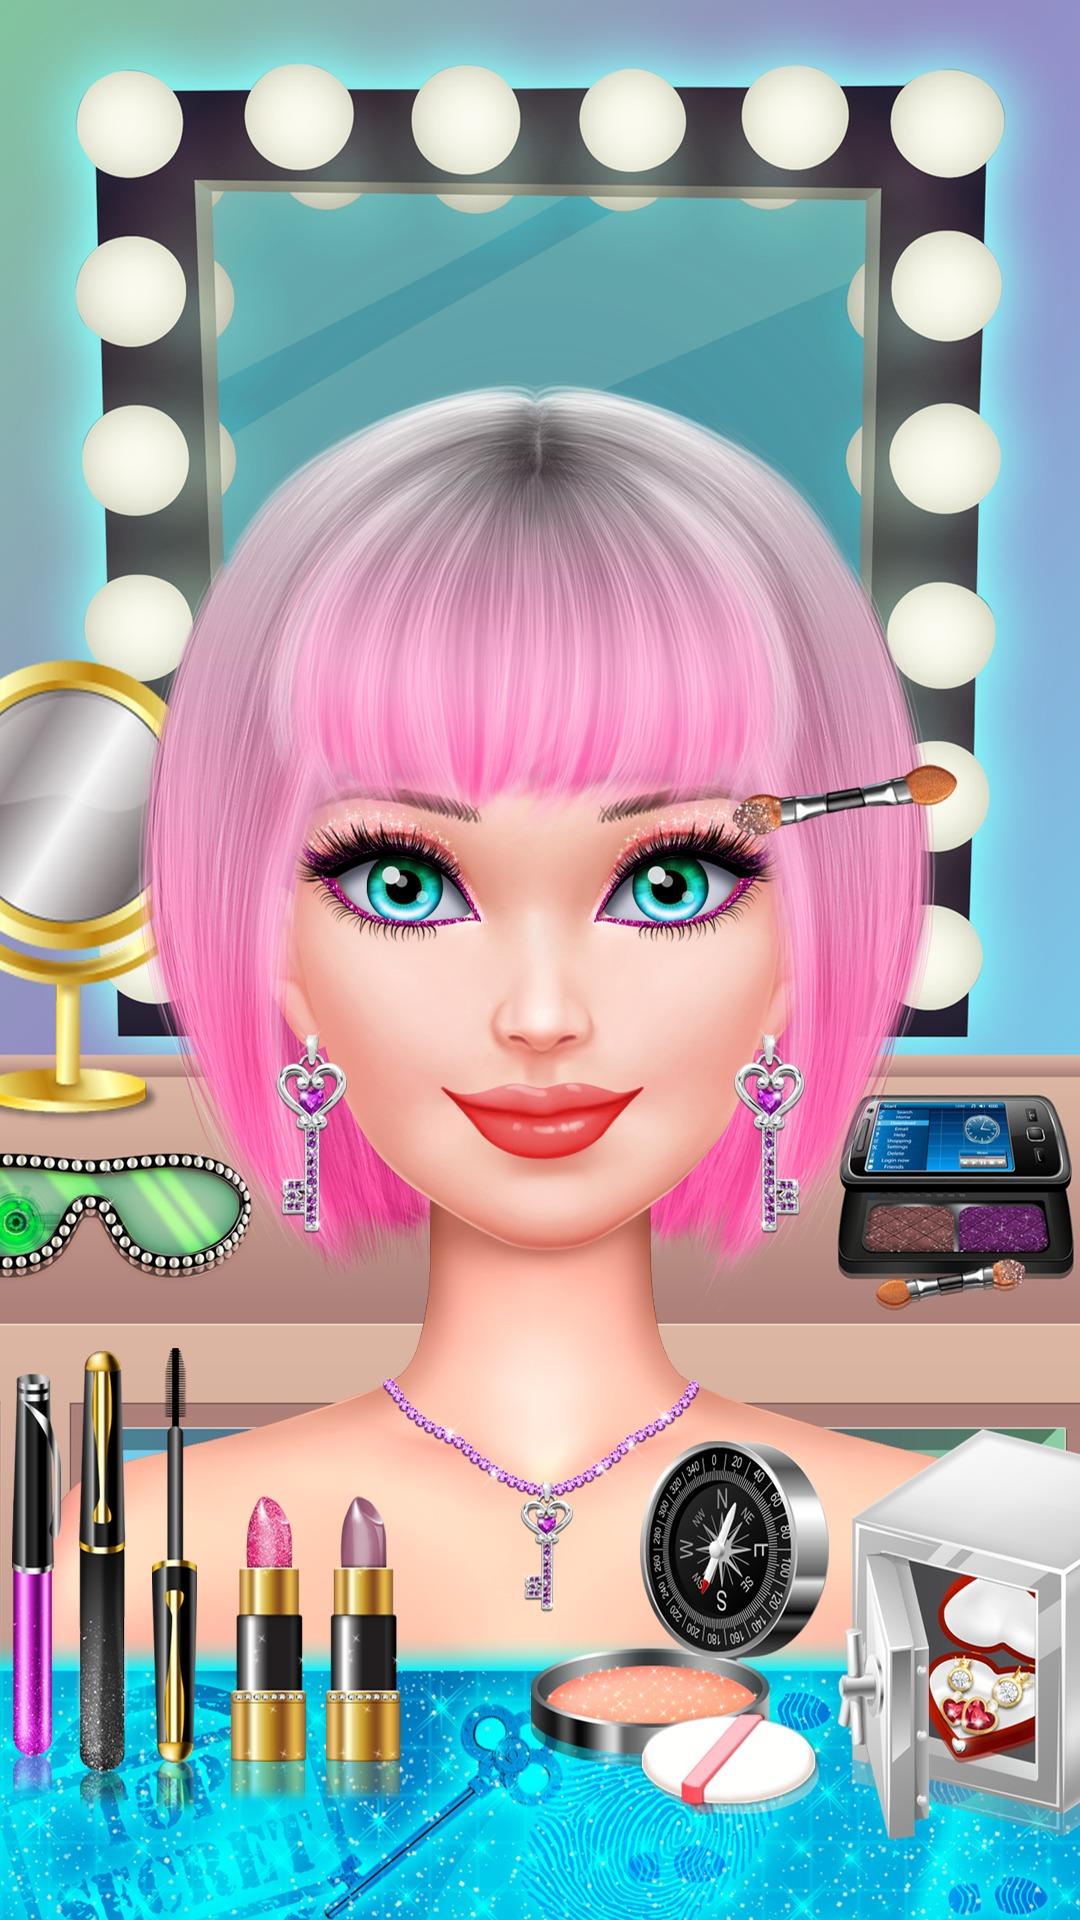 Surprising Amazon Com Spy Girl Salon Spa Makeup And Dress Up Super Short Hairstyles Gunalazisus